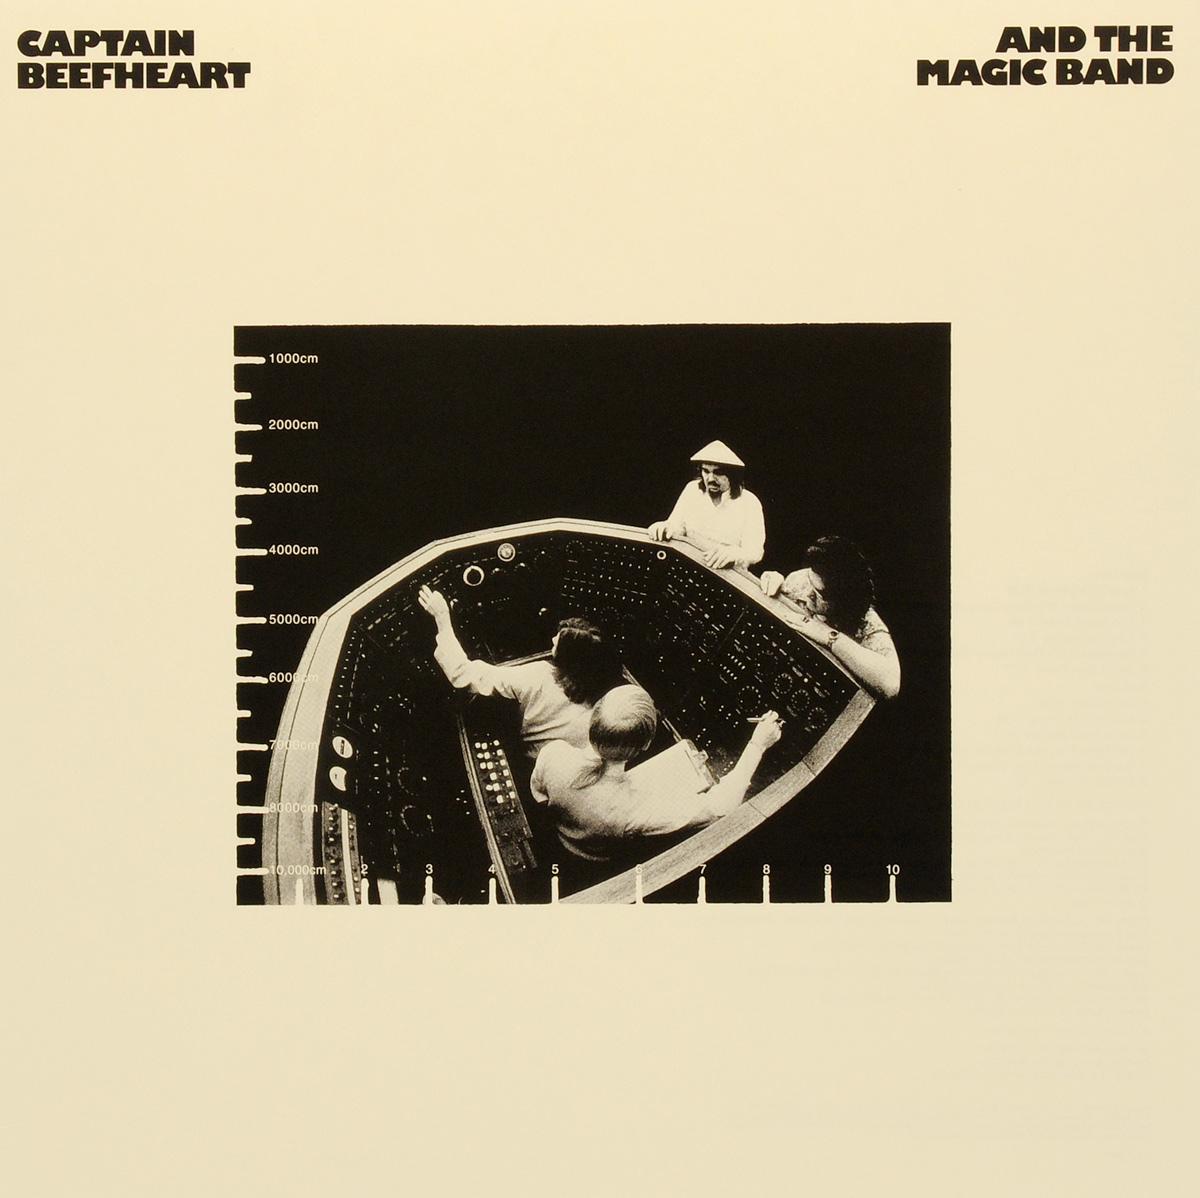 Captain Beefheart,The Magic Band Captain Beefheart And The Magic Band. Clear Spot (LP) the captain